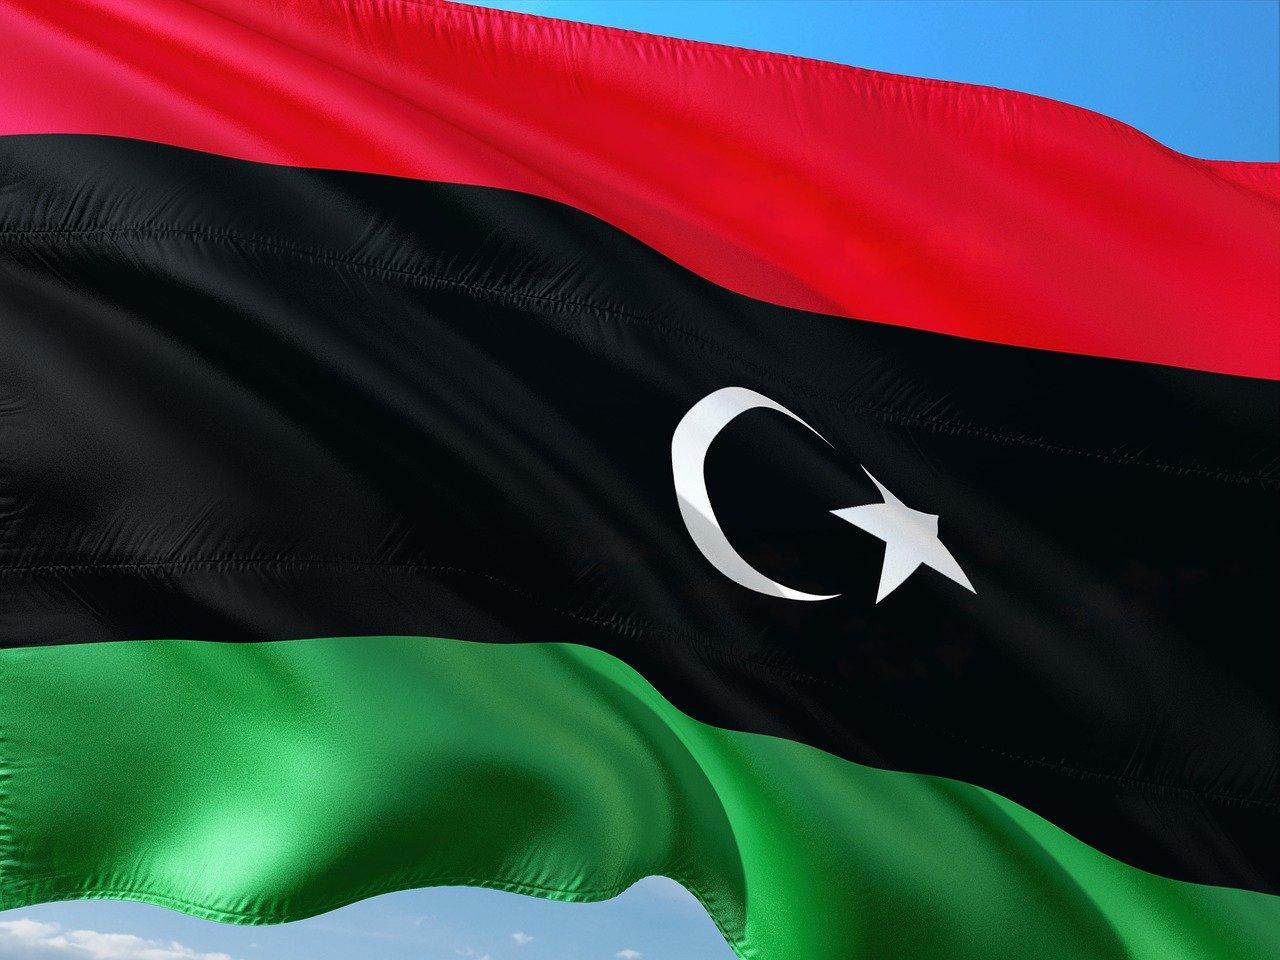 UK imposes sanctions on Libyan al-Kaniyat militia for international law violations